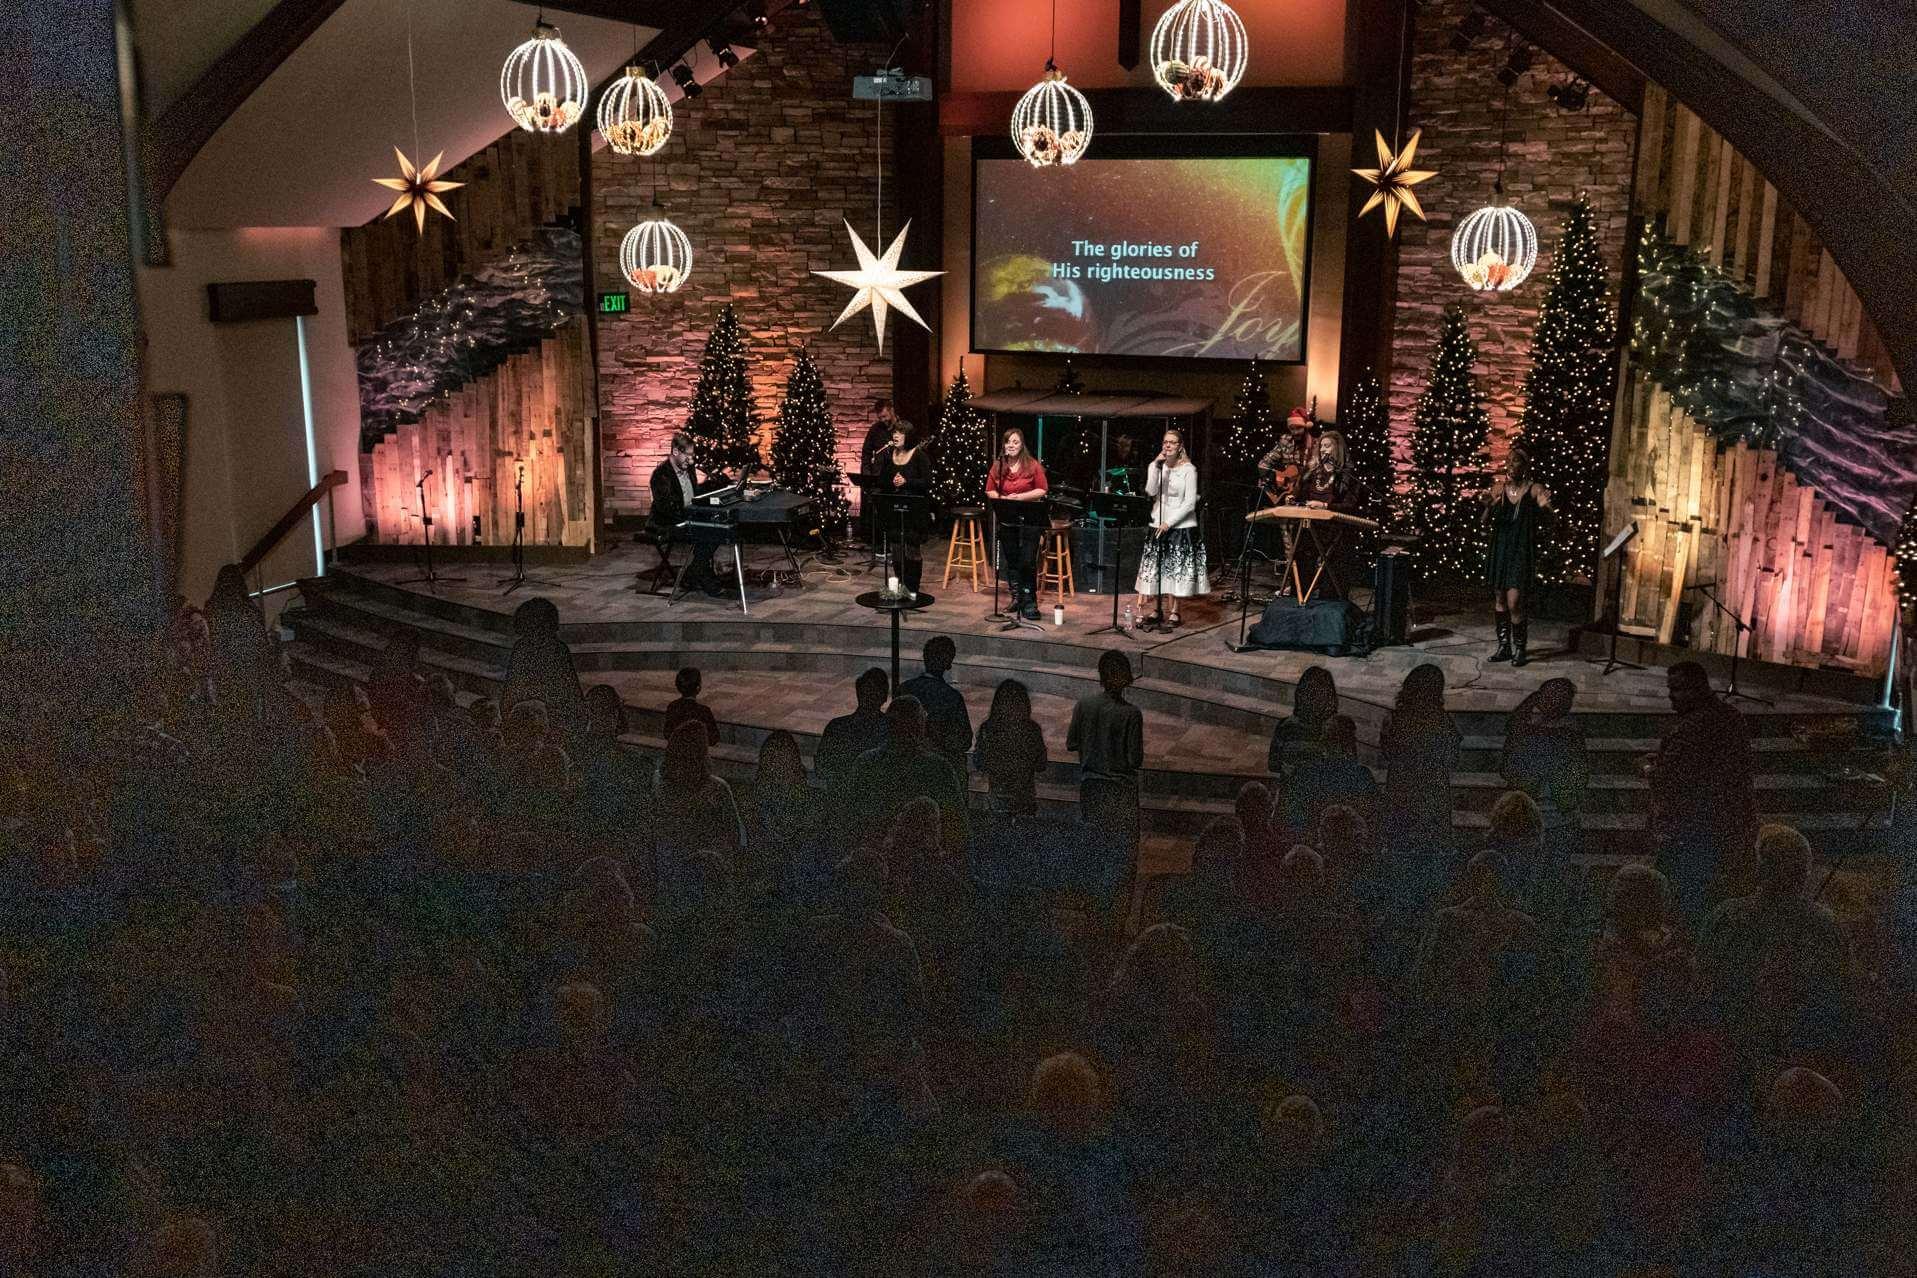 hots-church-eve-18-24